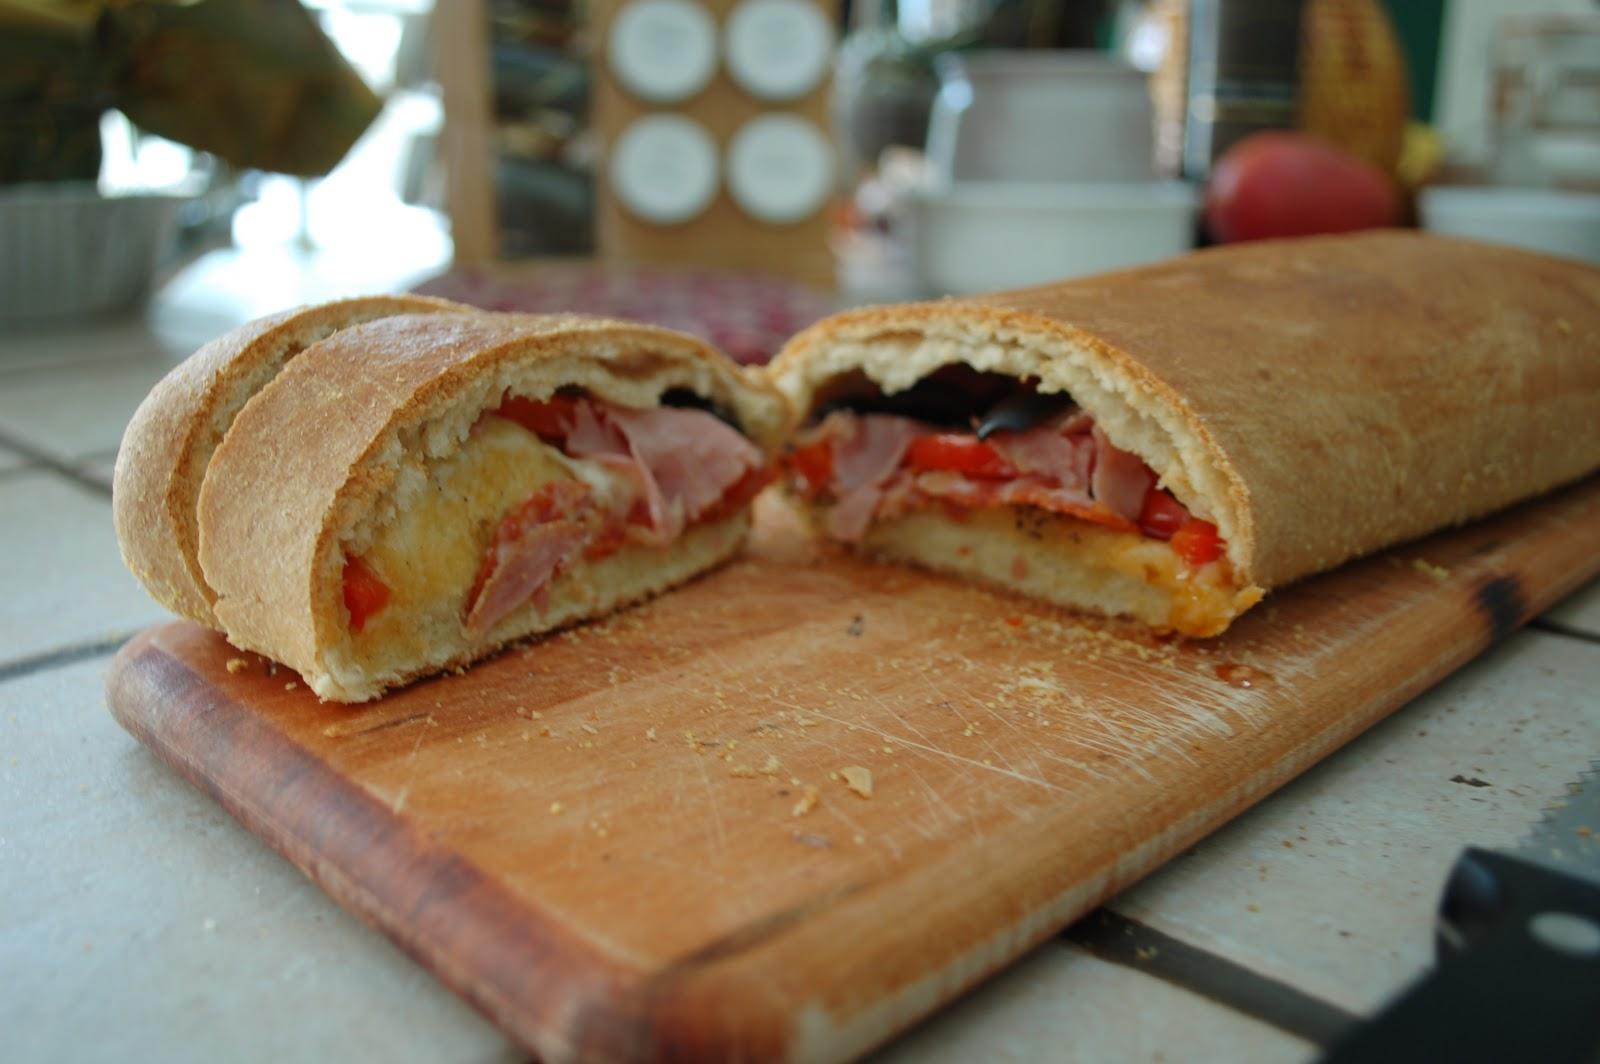 The Spice Garden: Stromboli - A Warm Sammich!